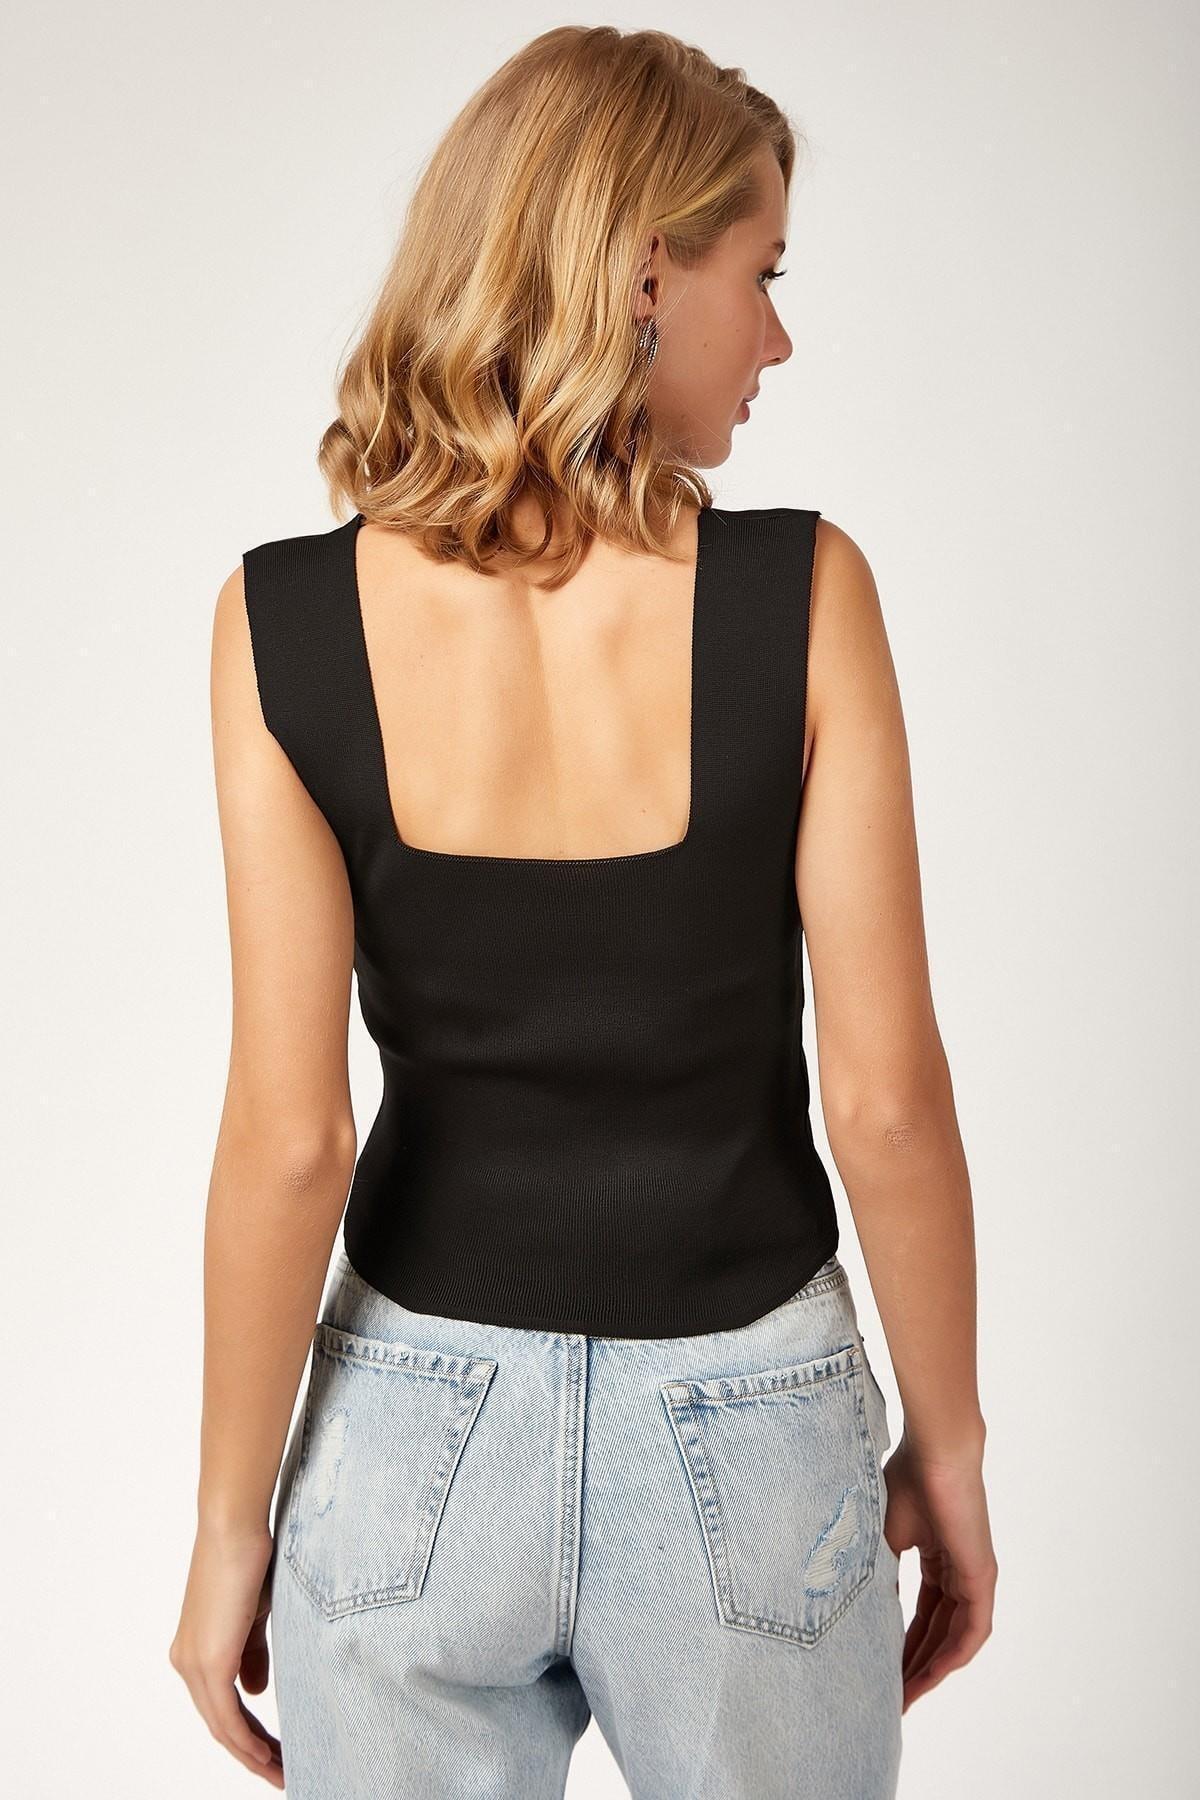 Asfa Moda Kadın Kare Yaka Likralı Fit Crop Bluz 2049